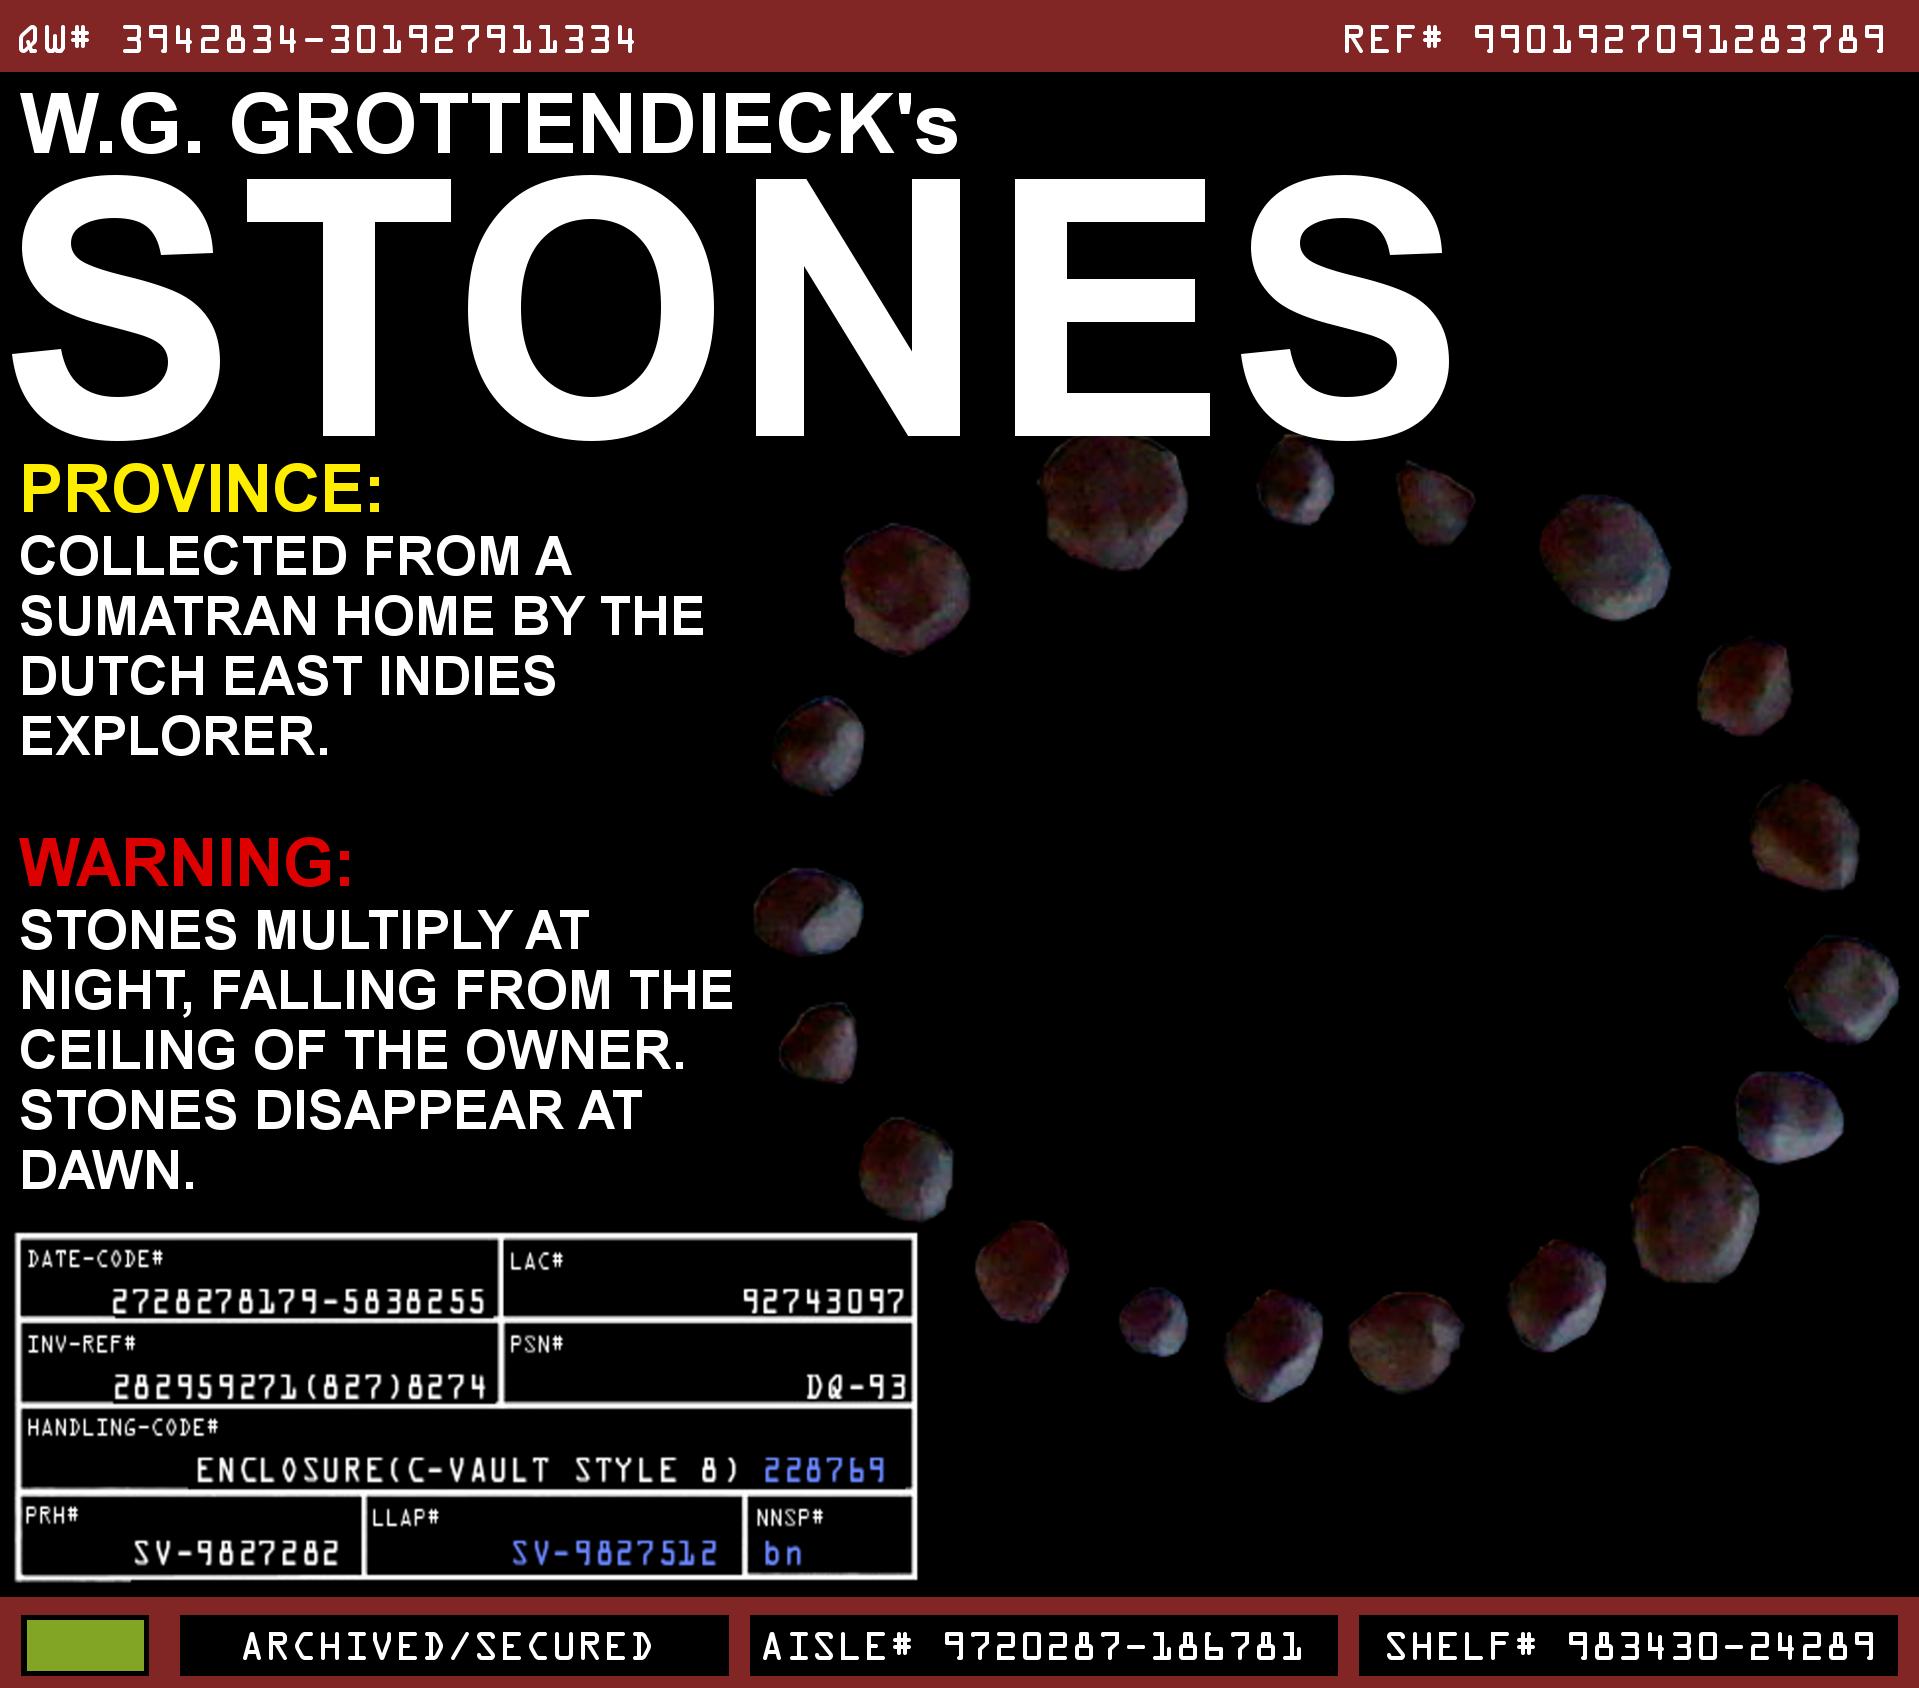 W. G. Grottendieck's Stones